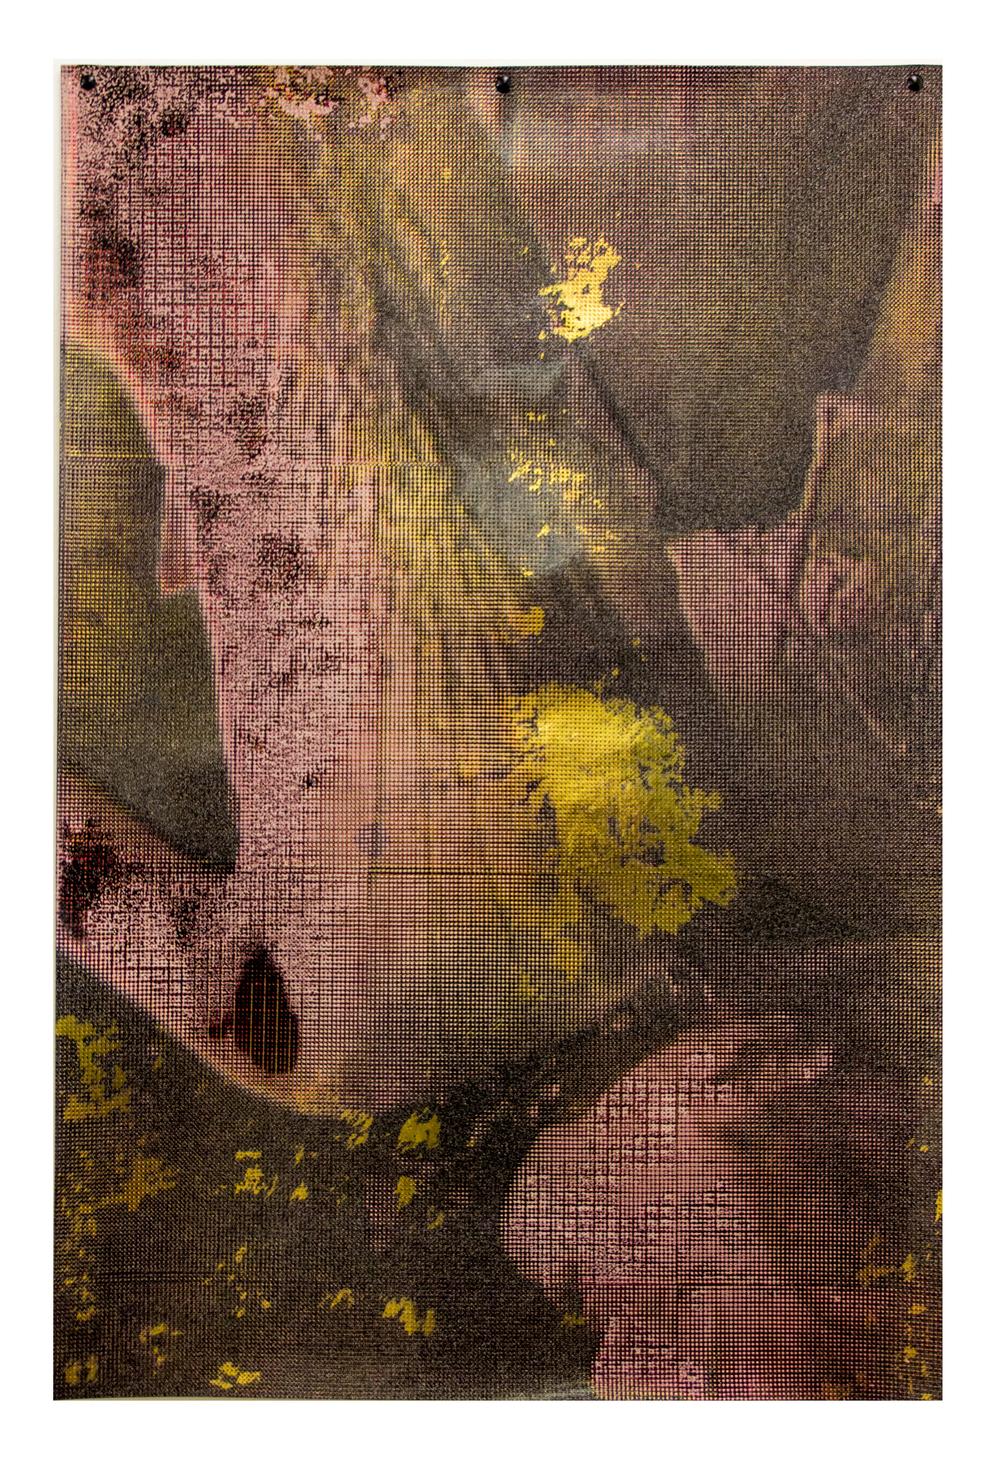 Untitled (02), 2012